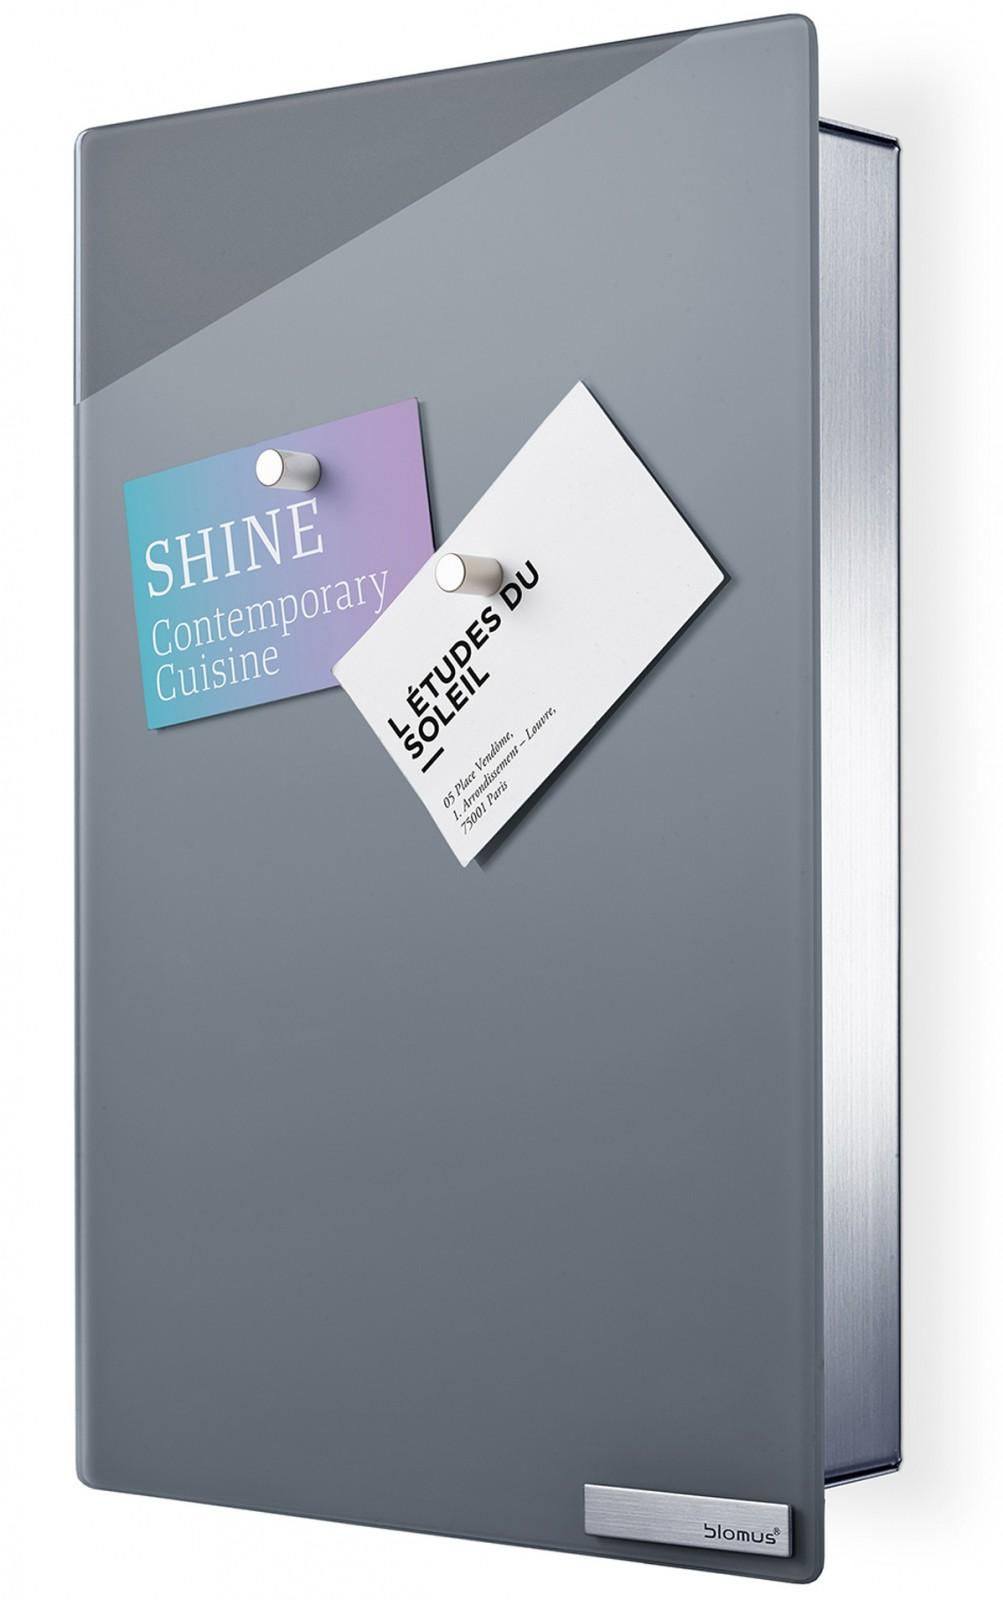 blomus edelstahl magnettafel schl sselkasten velio schl sselbrett inkl 6 magnete grau 65372. Black Bedroom Furniture Sets. Home Design Ideas